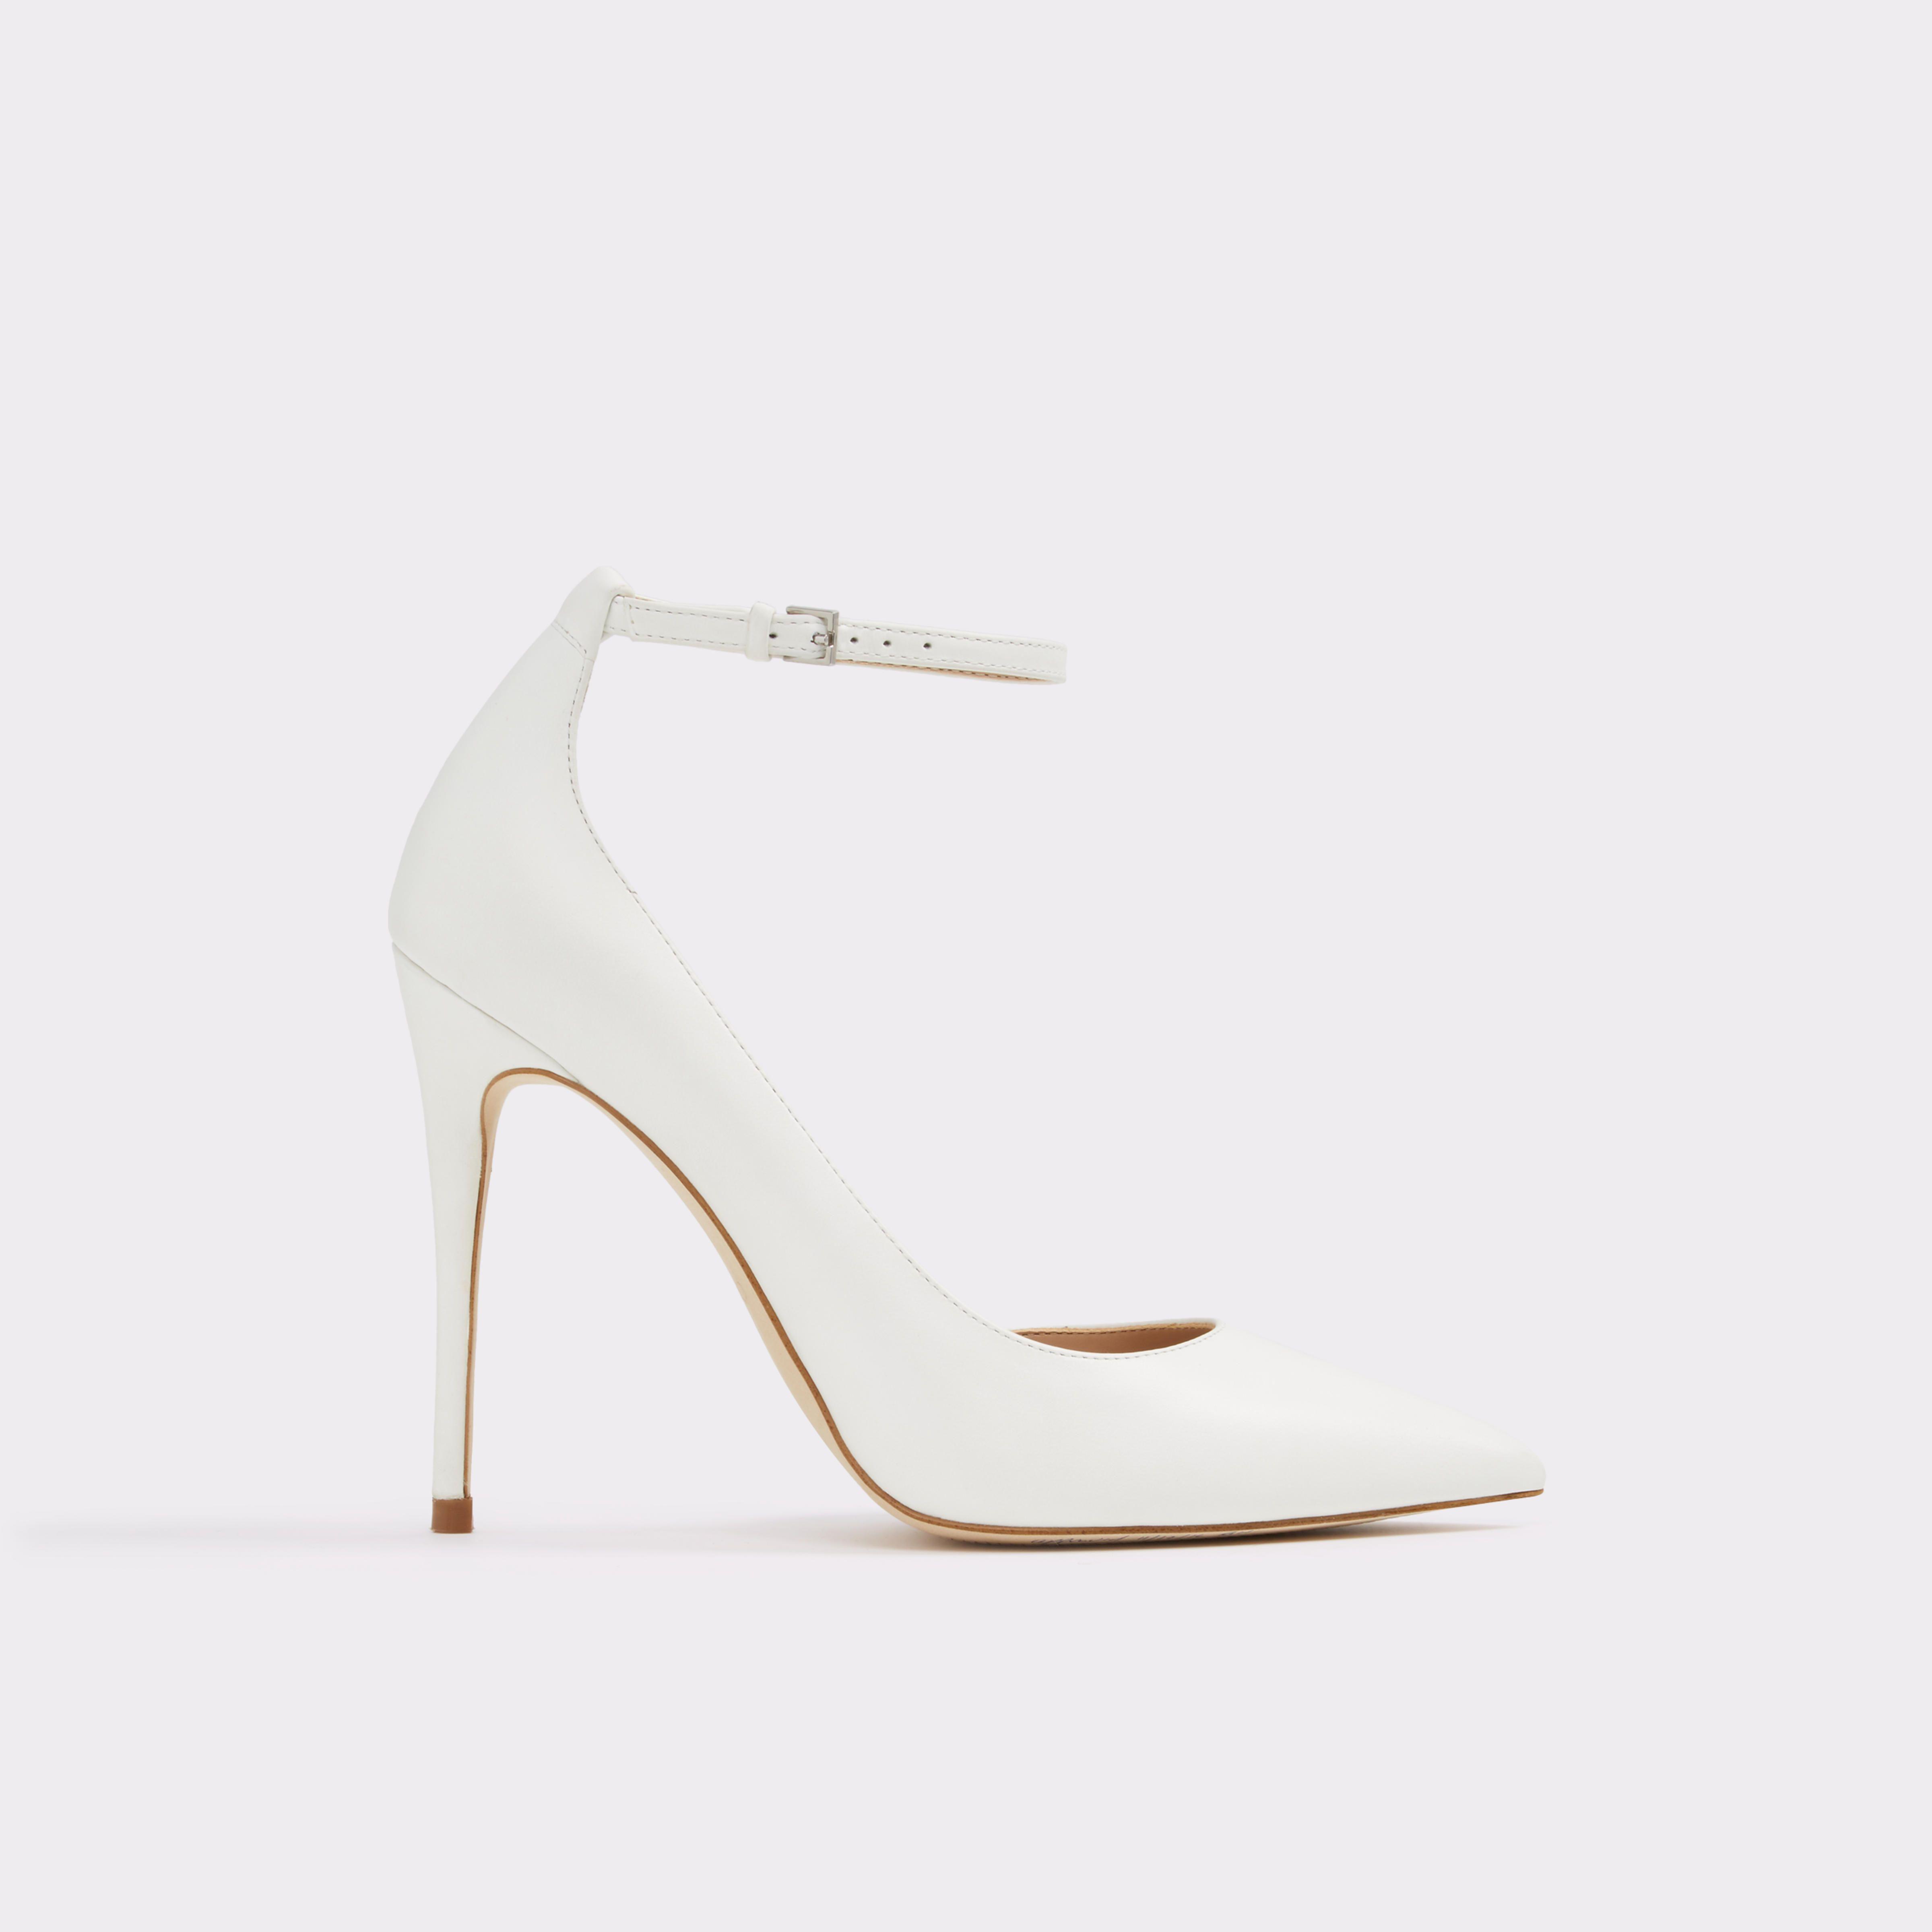 Staycey White Women's Pumps | ALDO US | Heels, Wedding shoes